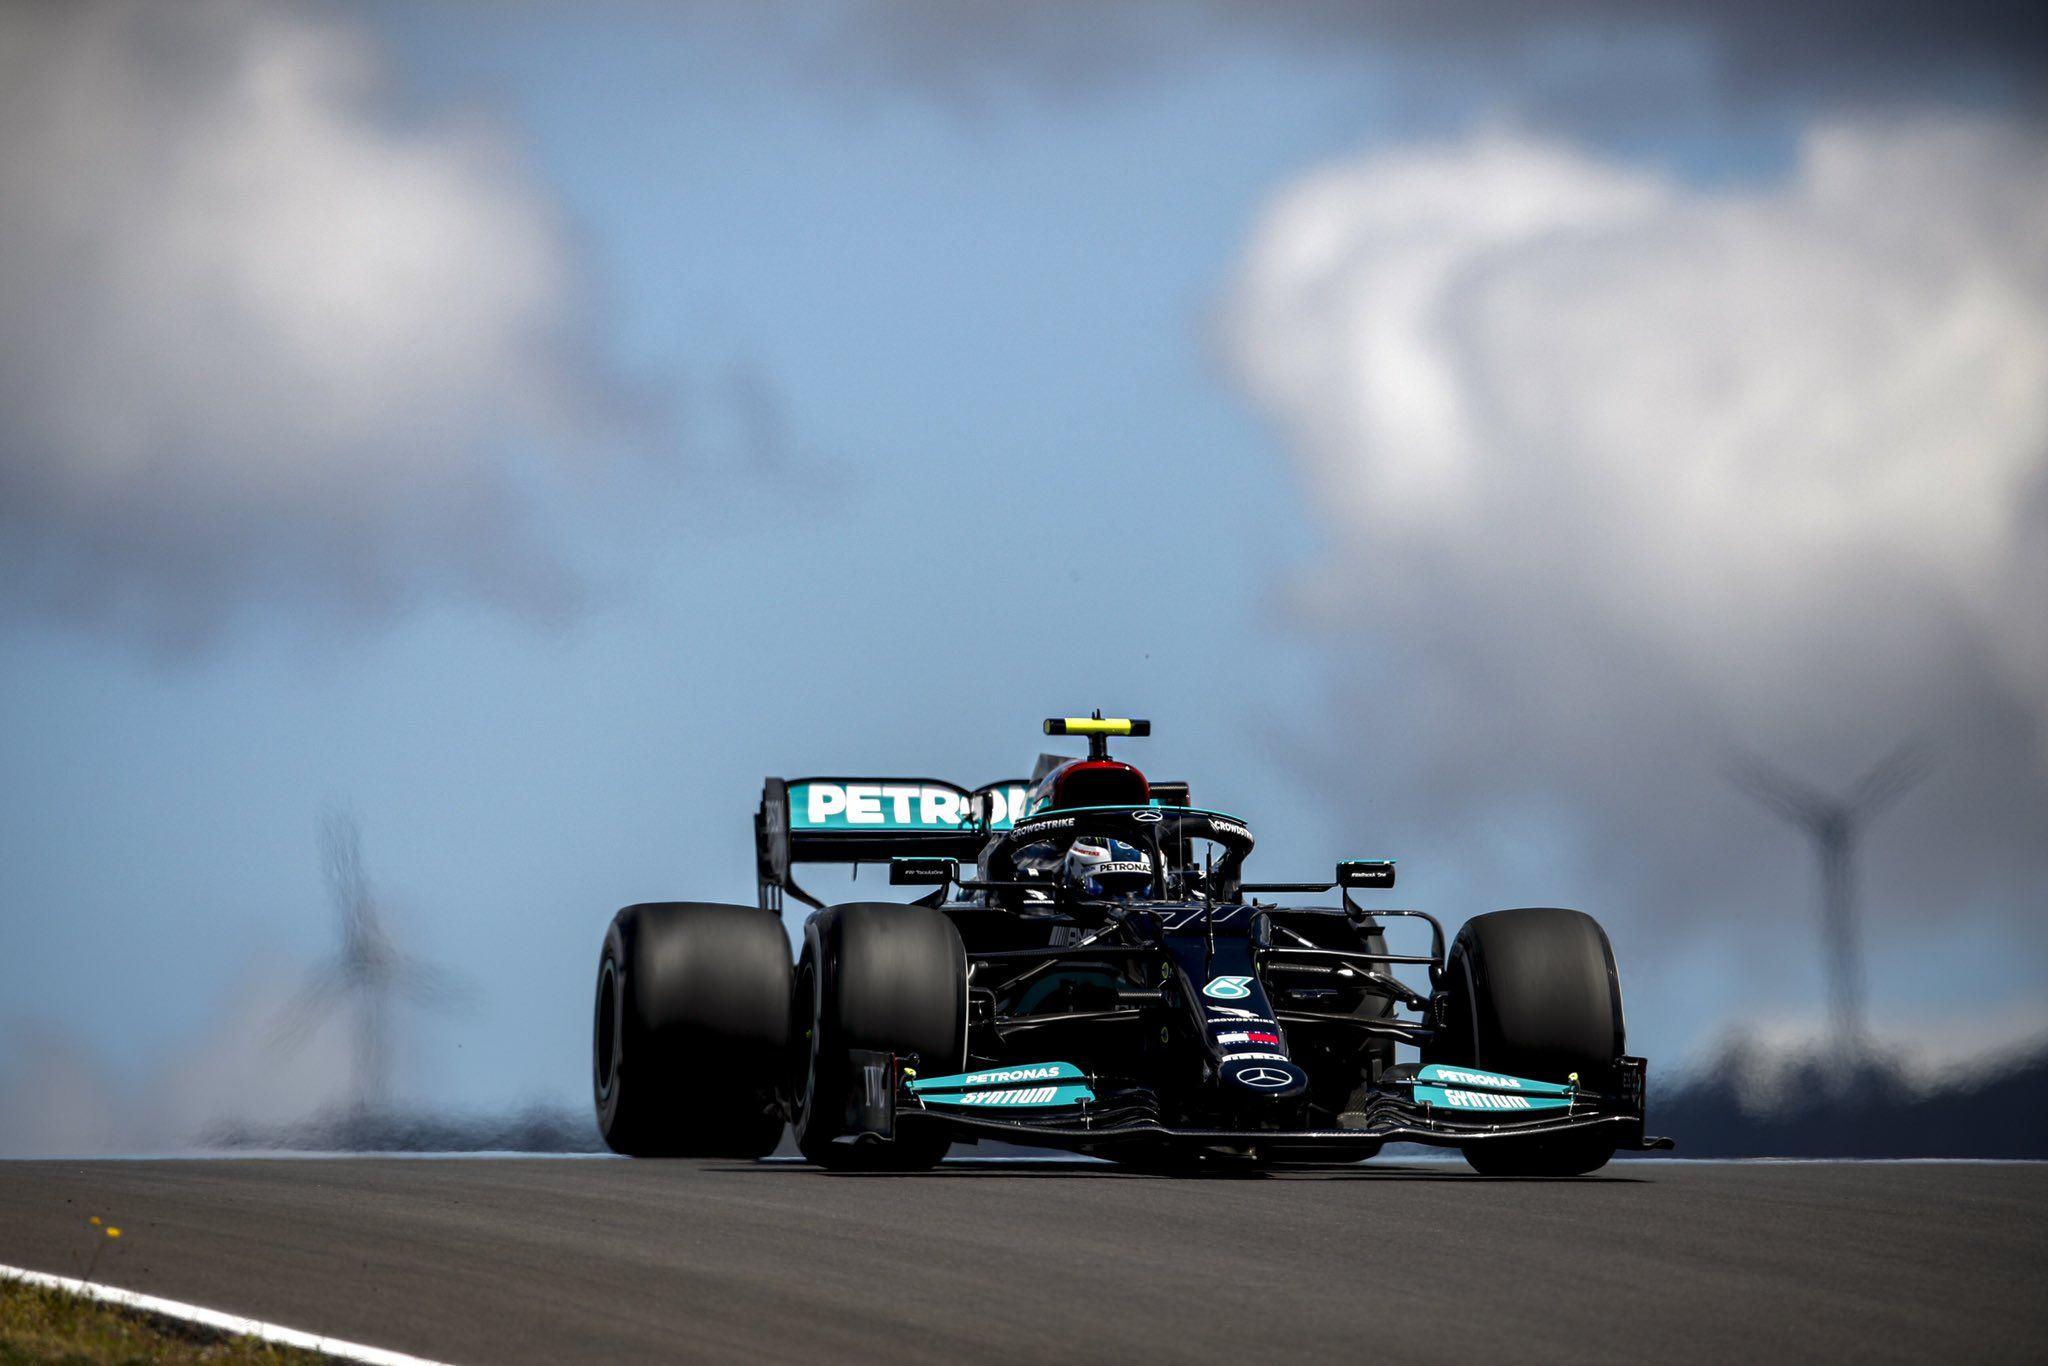 F1, Portuguese GP, Valtteri Bottas